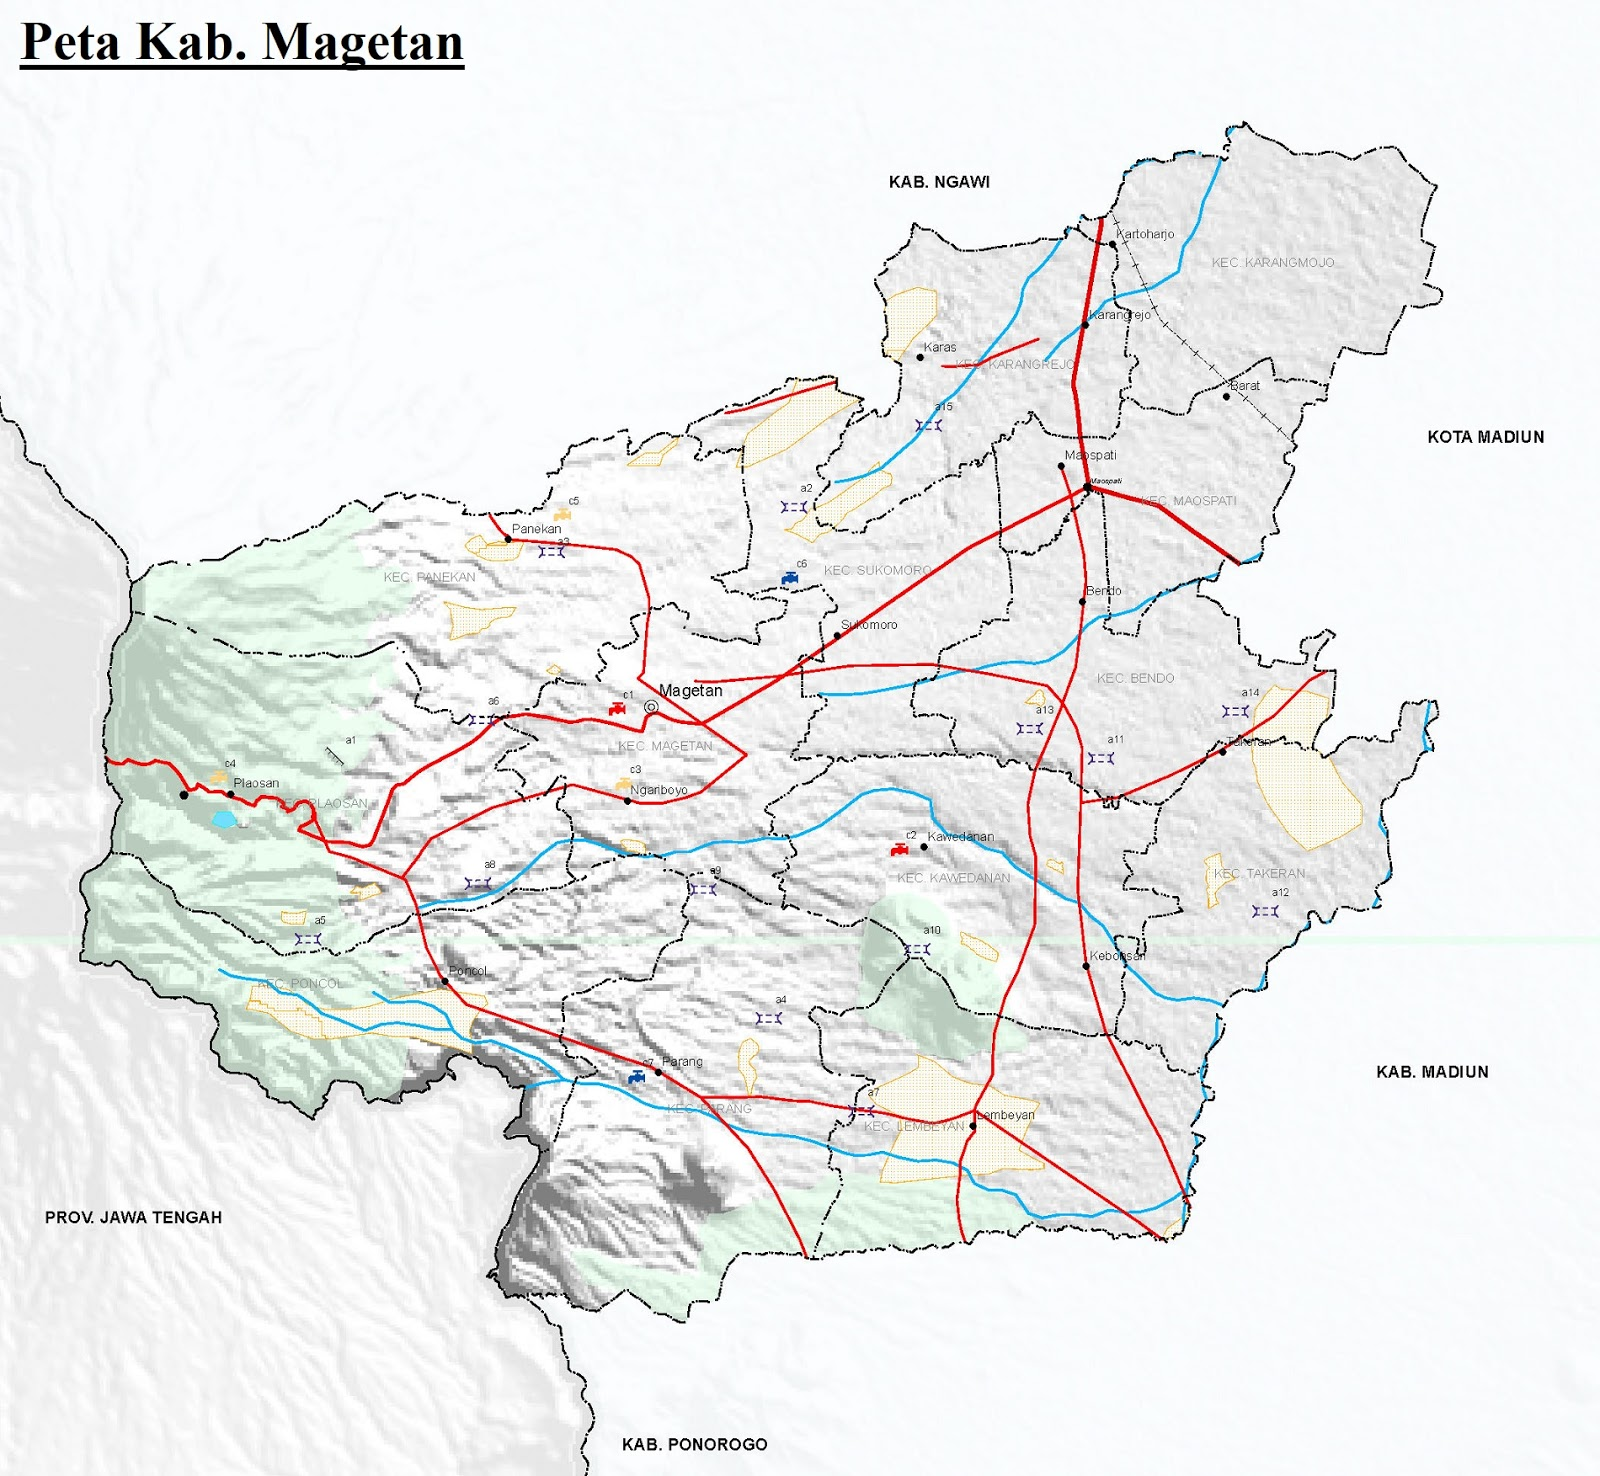 Peta Kabupaten Magetan HD